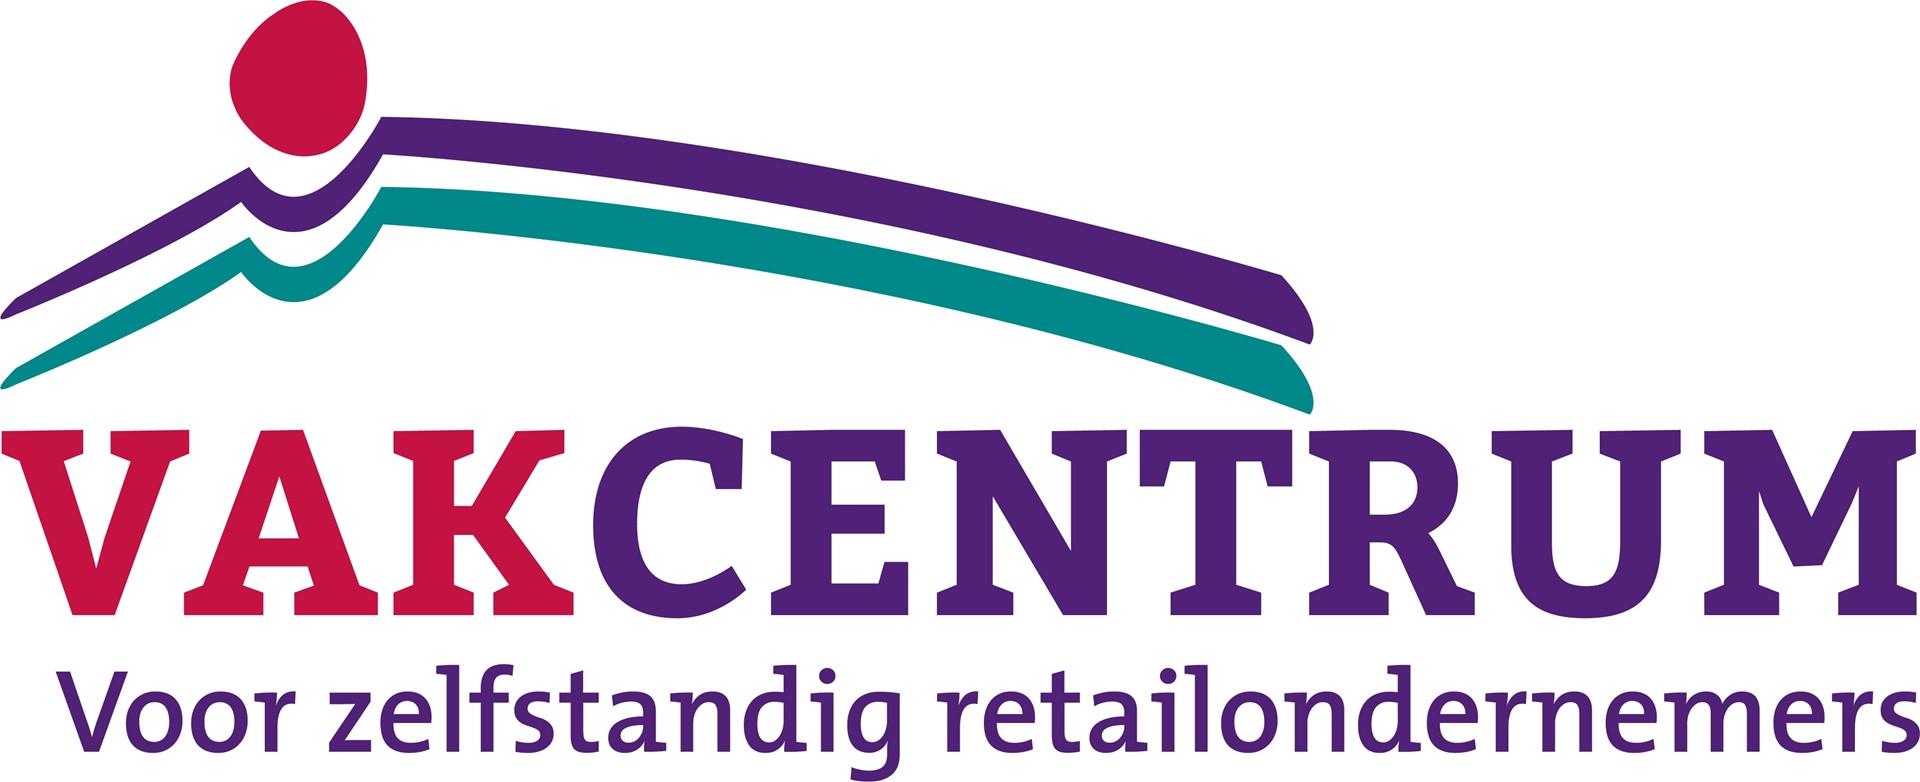 Vakcentrum logo.jpg